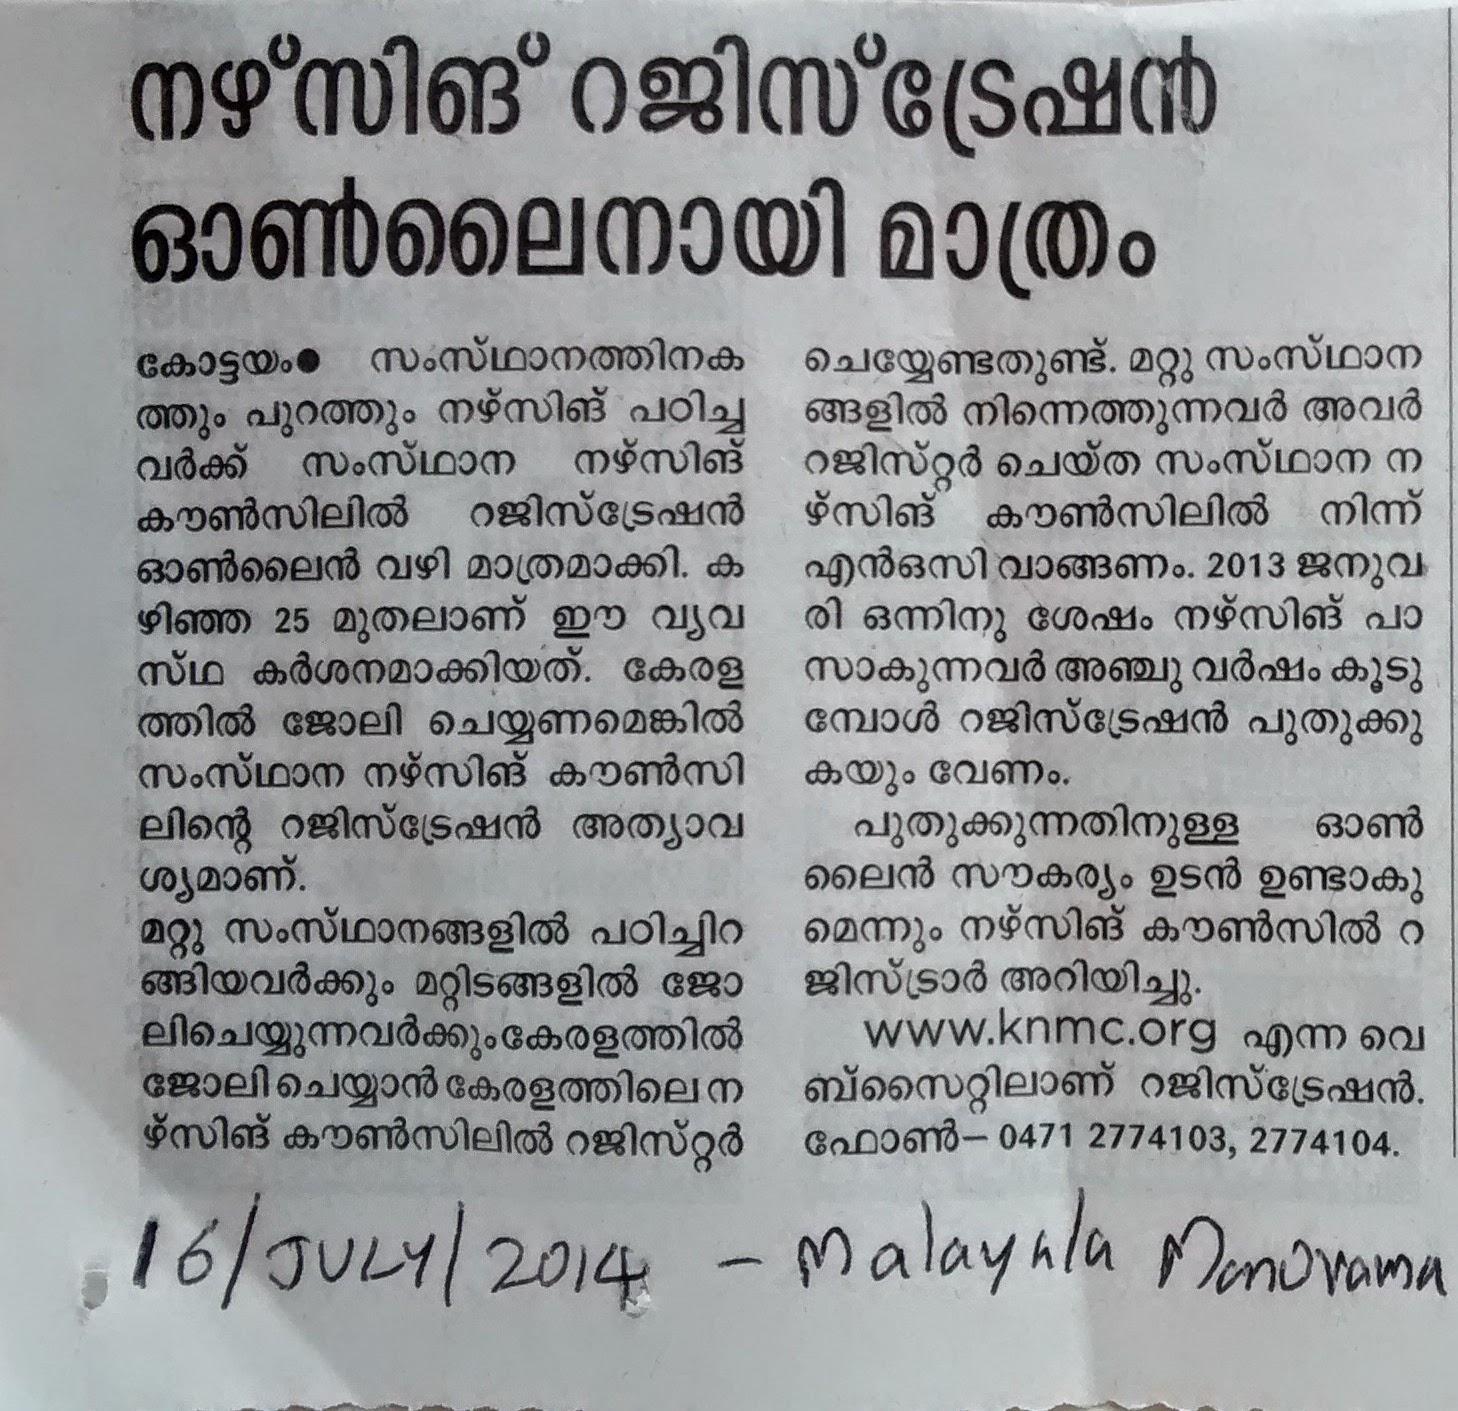 Kerala nursing council registration process 1 online registrationupdate on 18 july 2014 yadclub Images